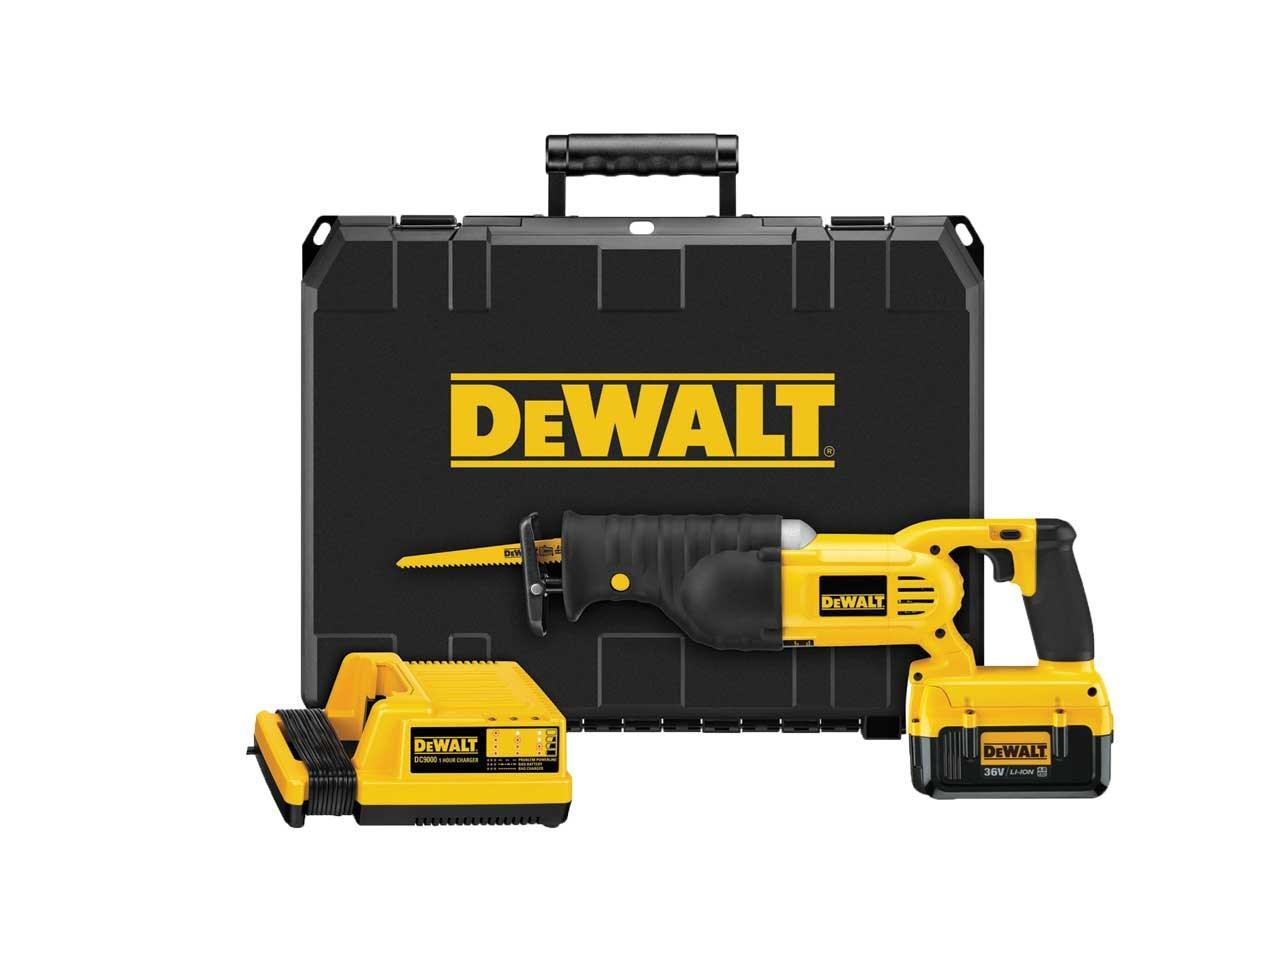 Dewalt dc305m2 36v reciprocating saw kit box 2 x 40ah li ion greentooth Choice Image